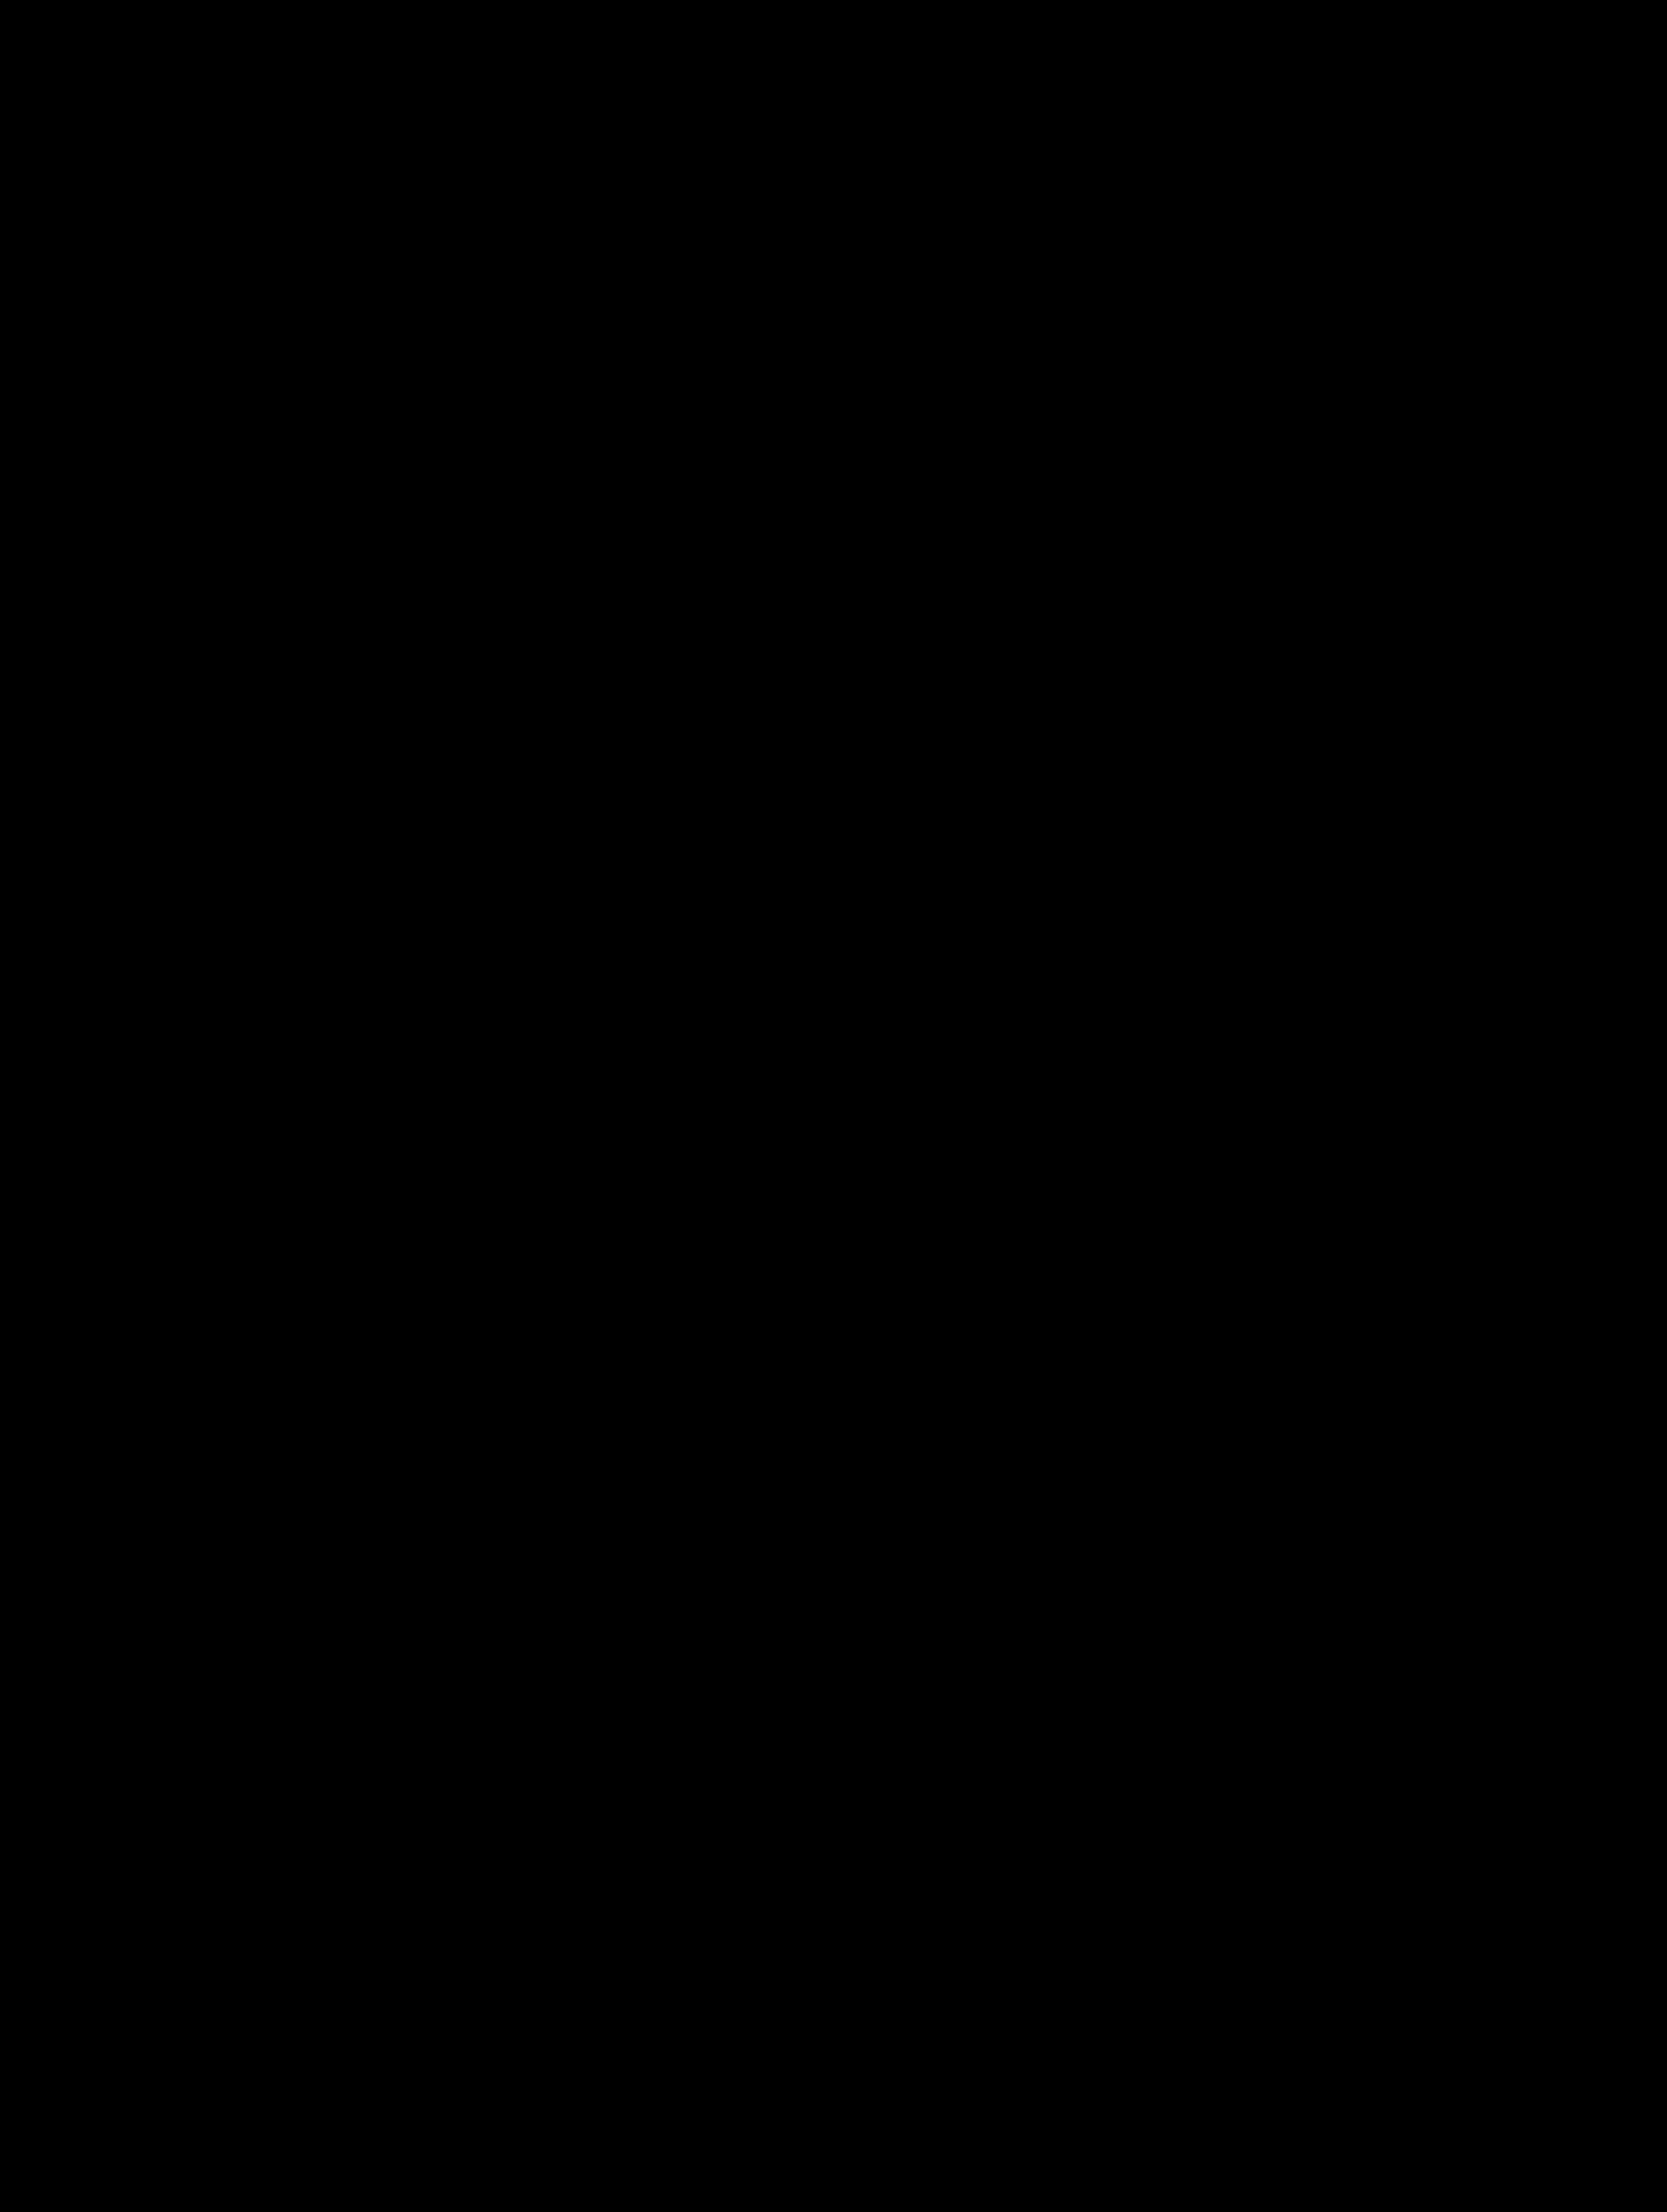 vector hamsa outline